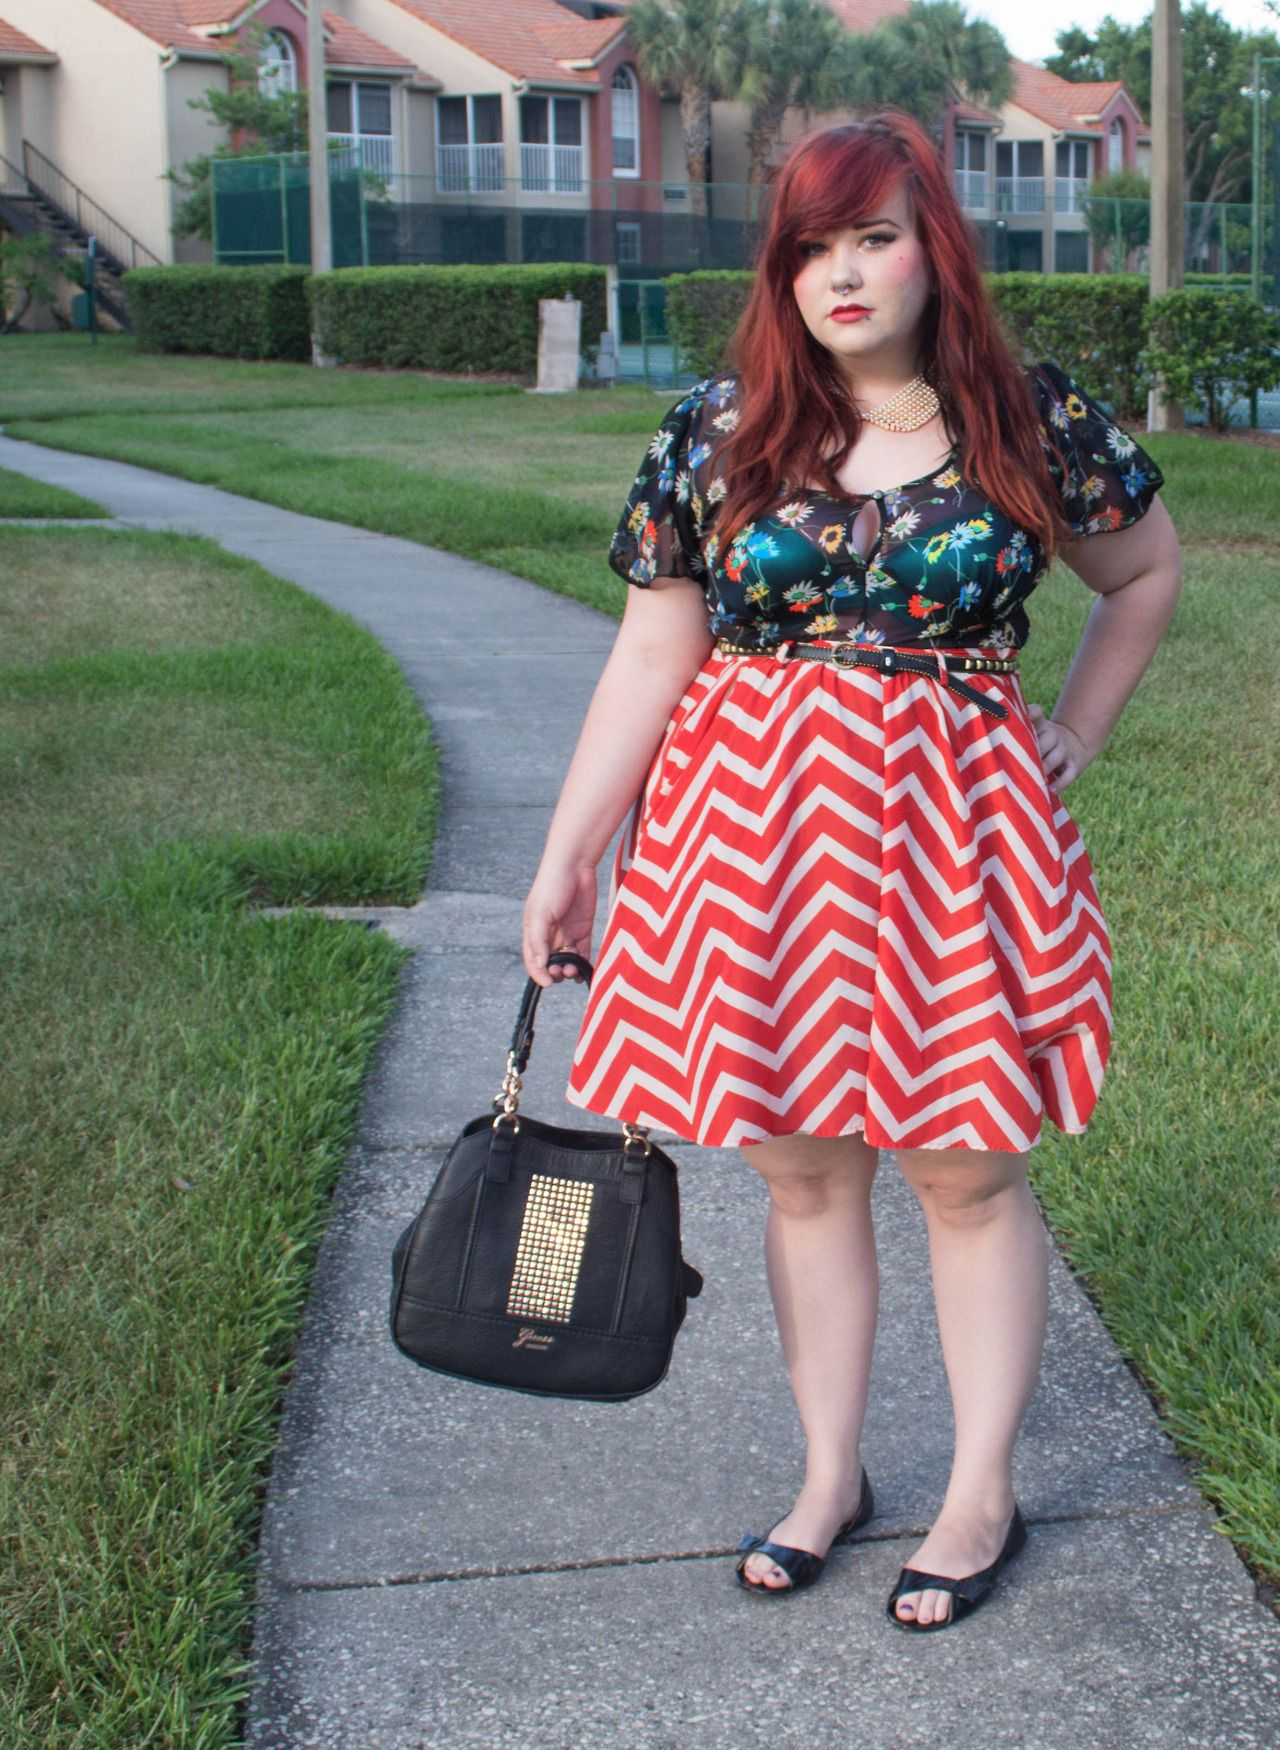 Women 39 S Apparel Pinterest Curvy Girl Fashion Chubby Girl